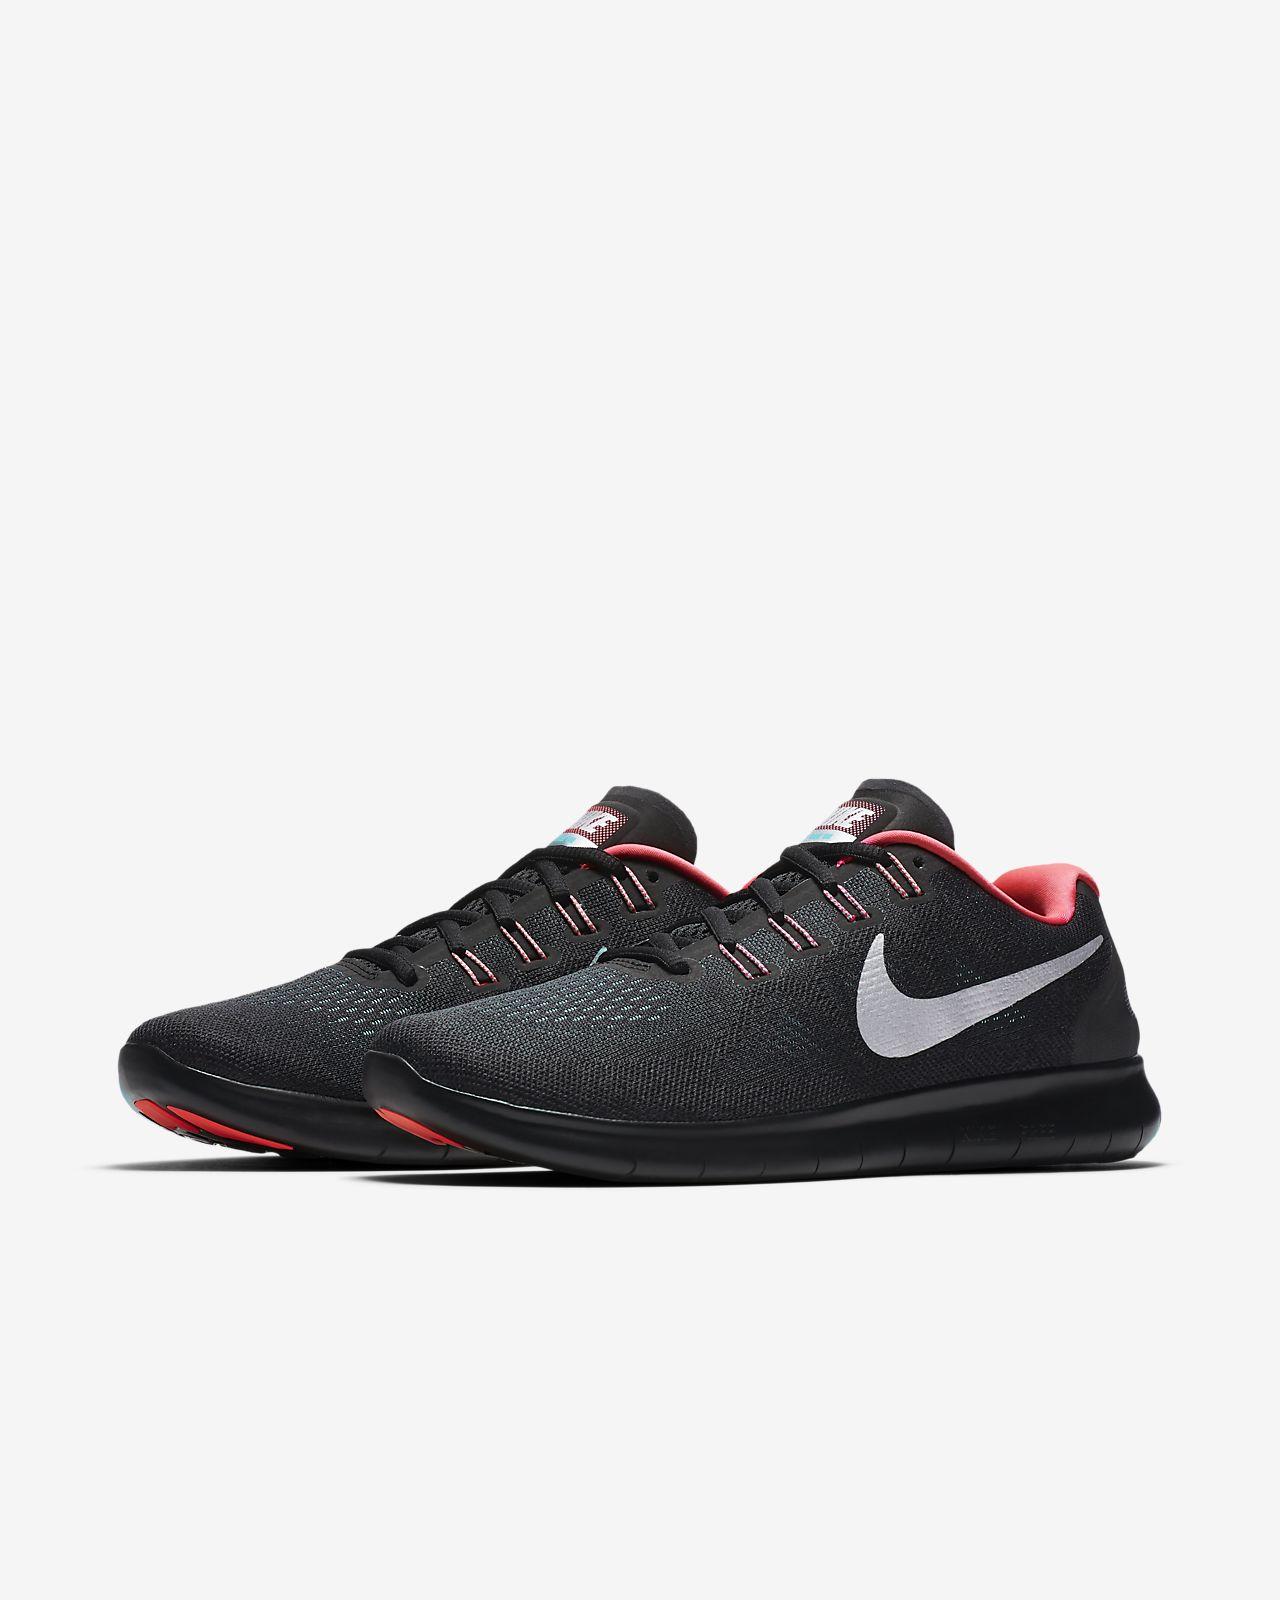 ... Nike Free RN 2017 Women's Running Shoe